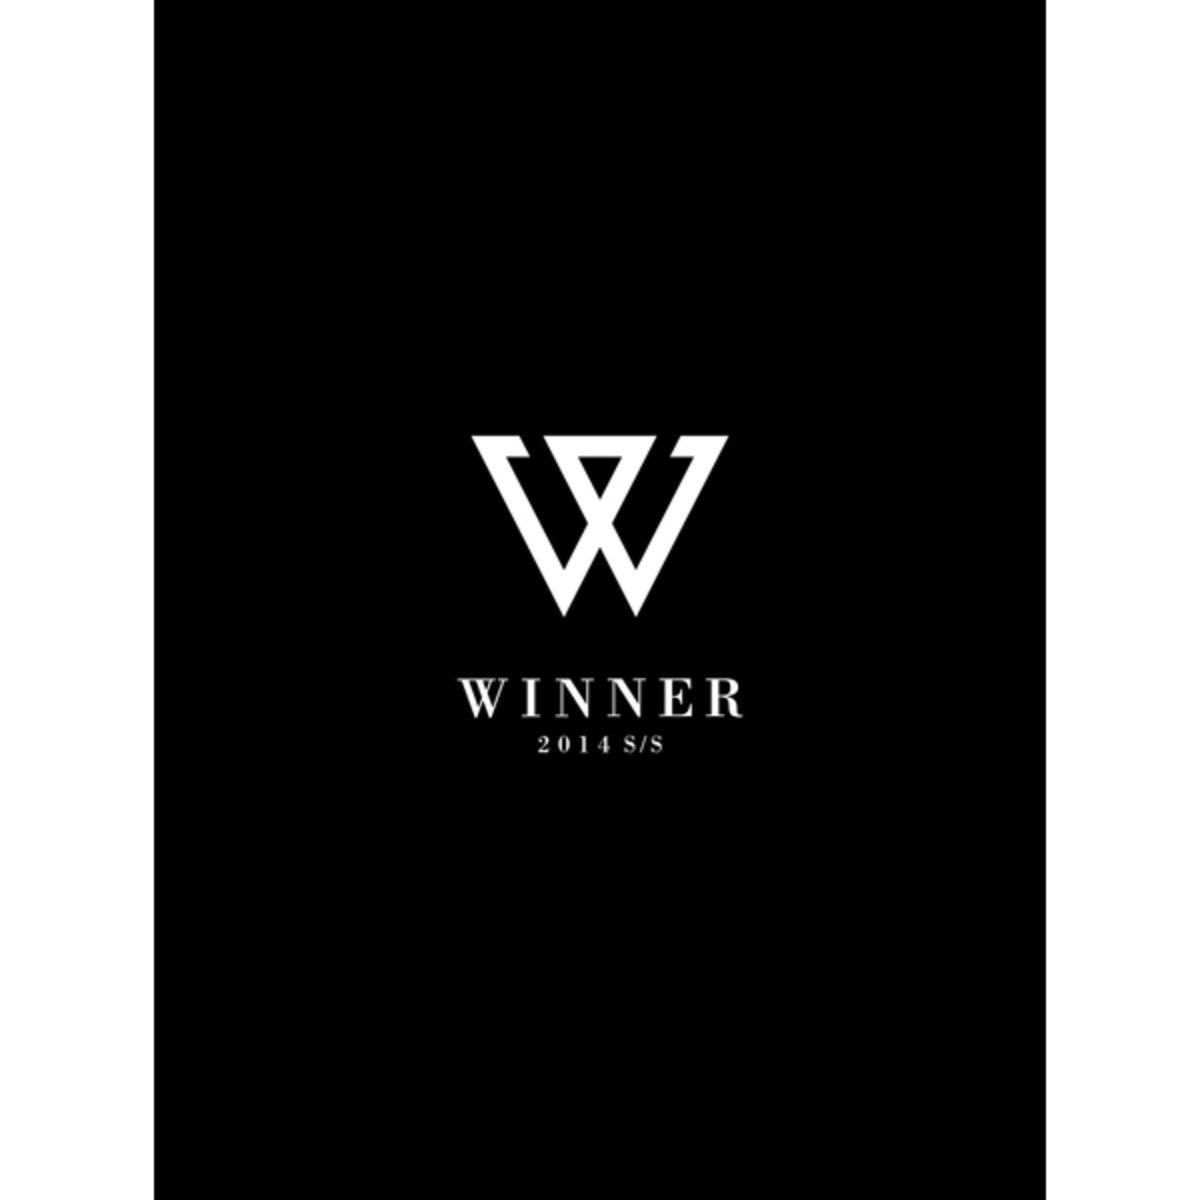 WINNER - DEBUT ALBUM [2014 S/S] (LAUNCHING EDITION)_8809269503268